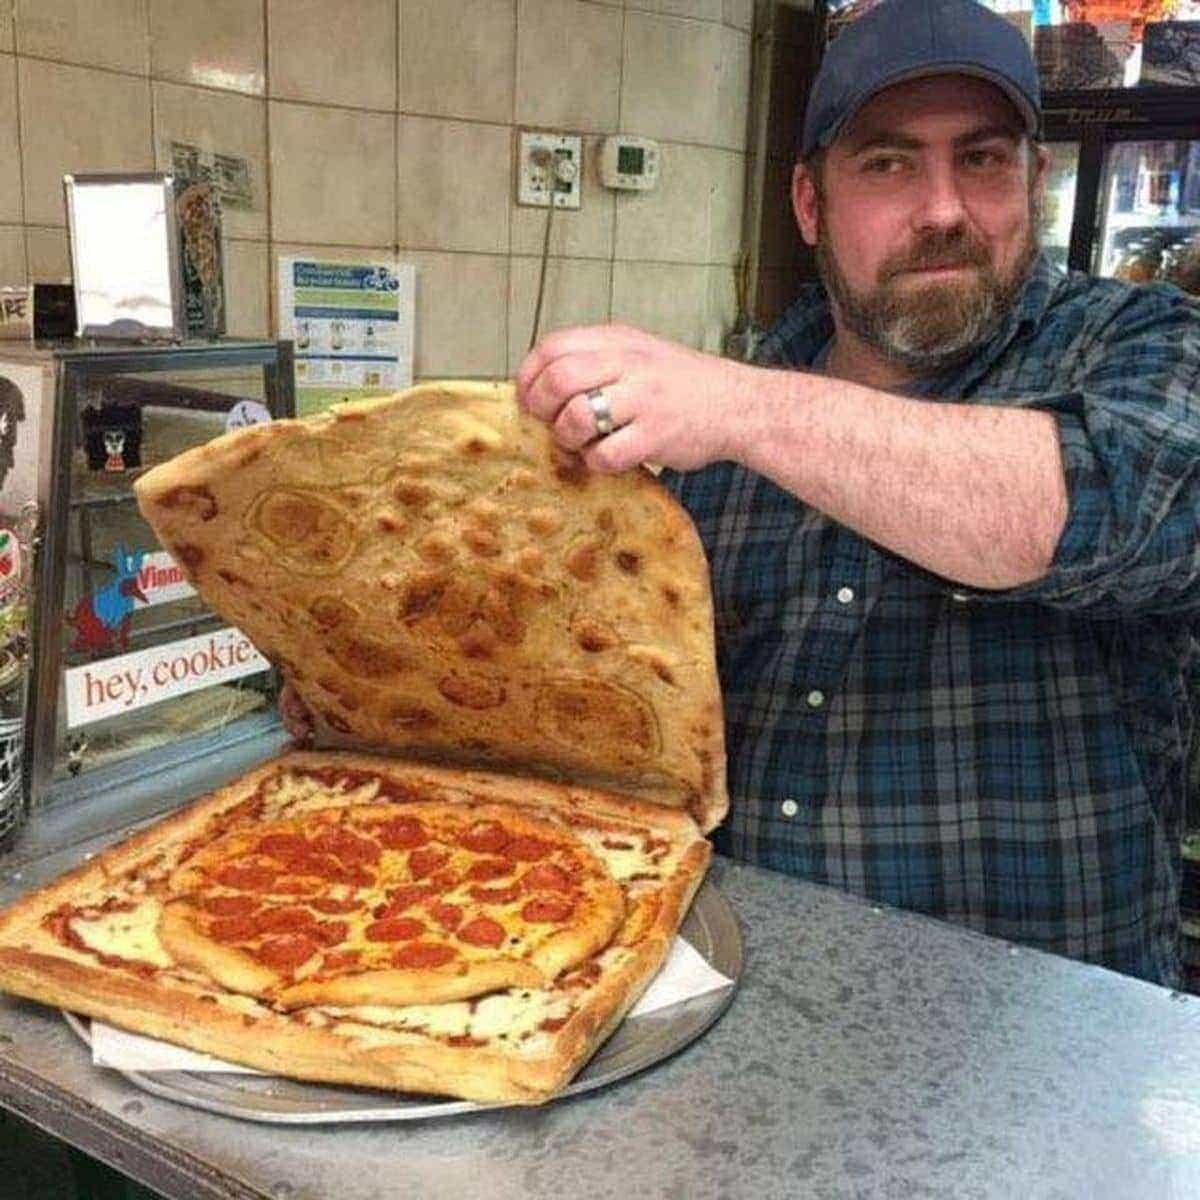 Die ultimative Pizza-Verpackung ist aus ... Pizza | Lustiges | Was is hier eigentlich los?